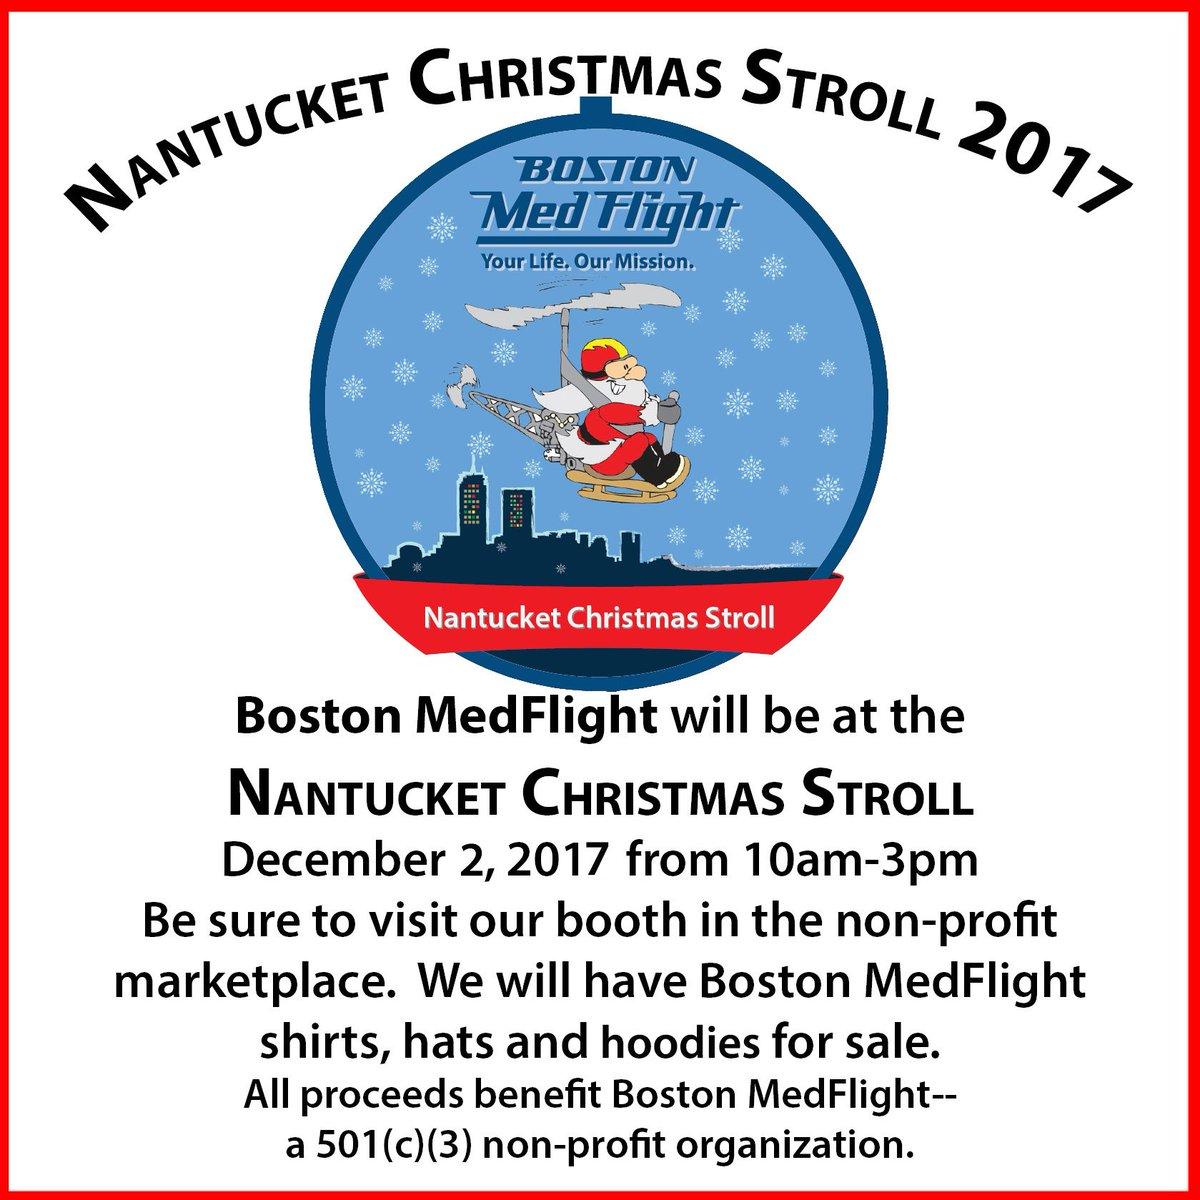 boston medflight on twitter boston medflight will be taking part in the 2017 nantucket christmas stroll look for us